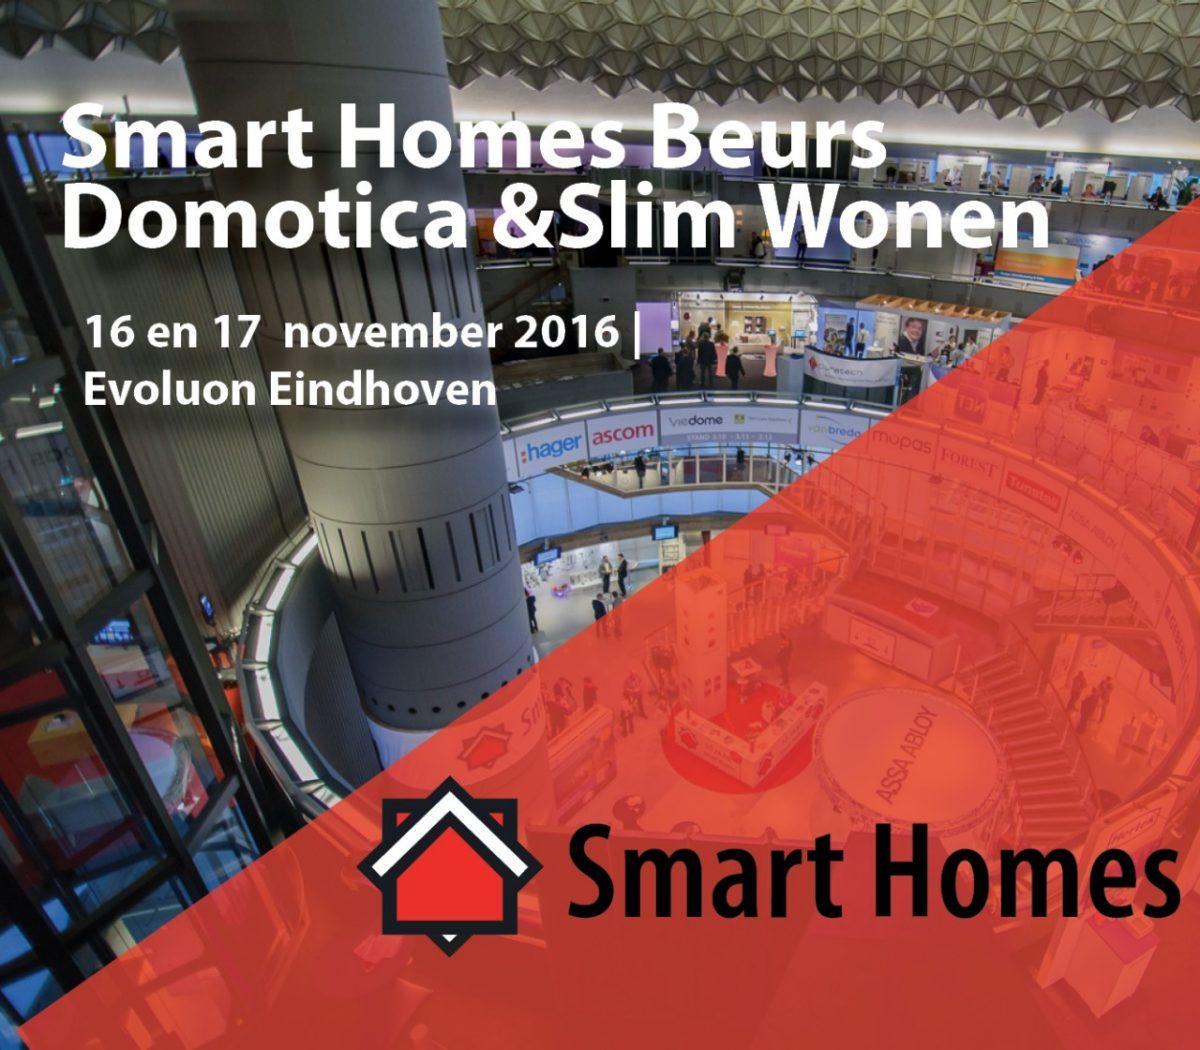 Beurs Domotica & Slim Wonen 2016: Beyond big data